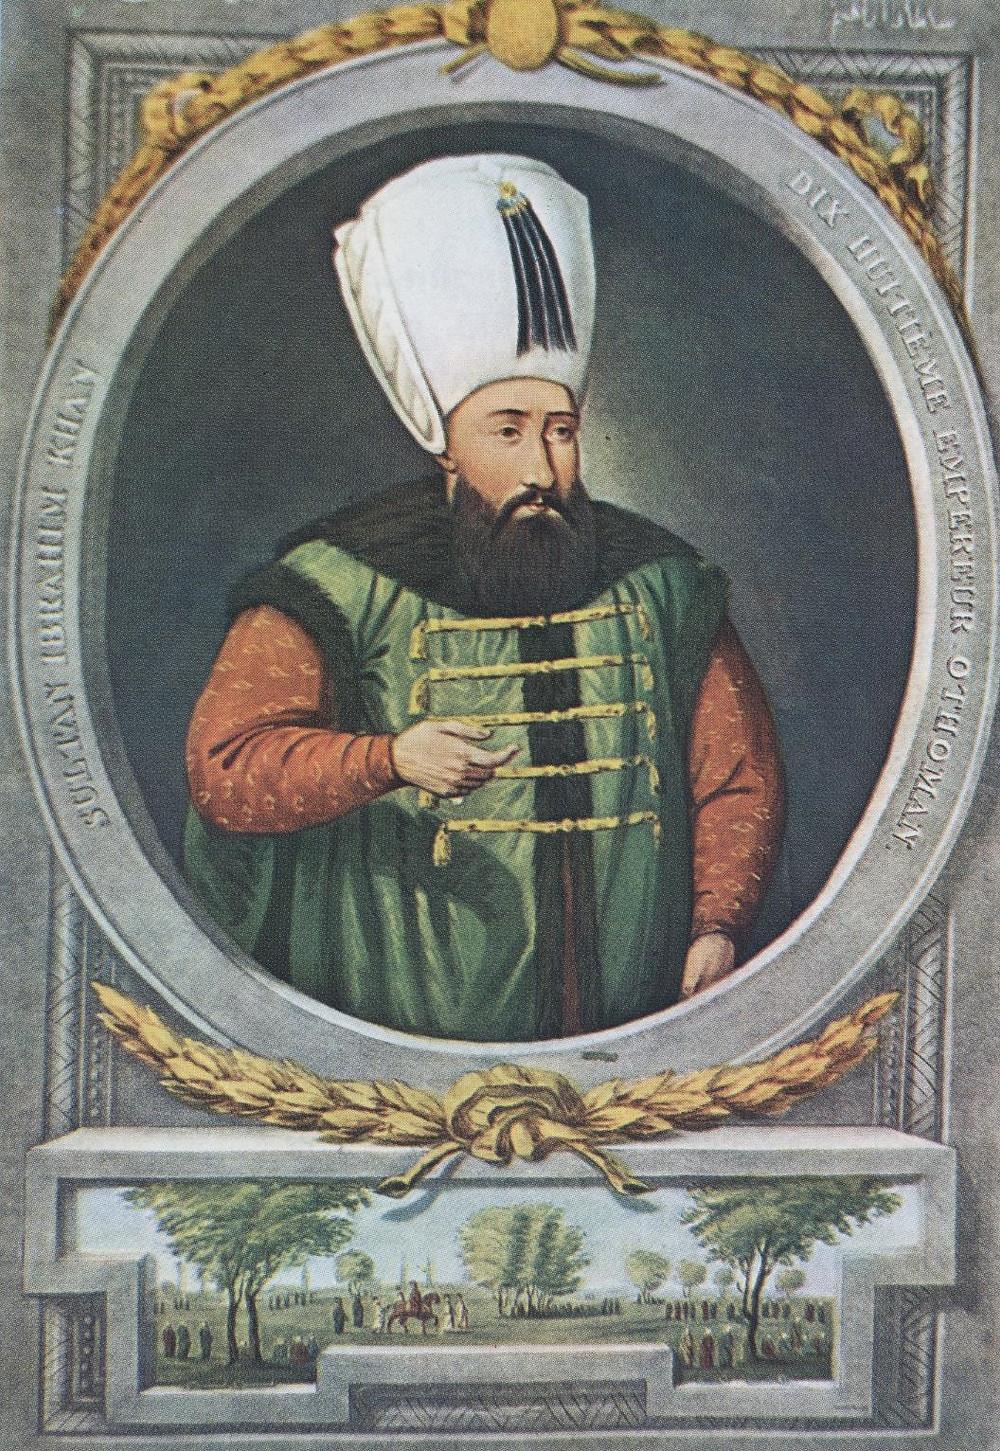 Sultan Ibrahim I